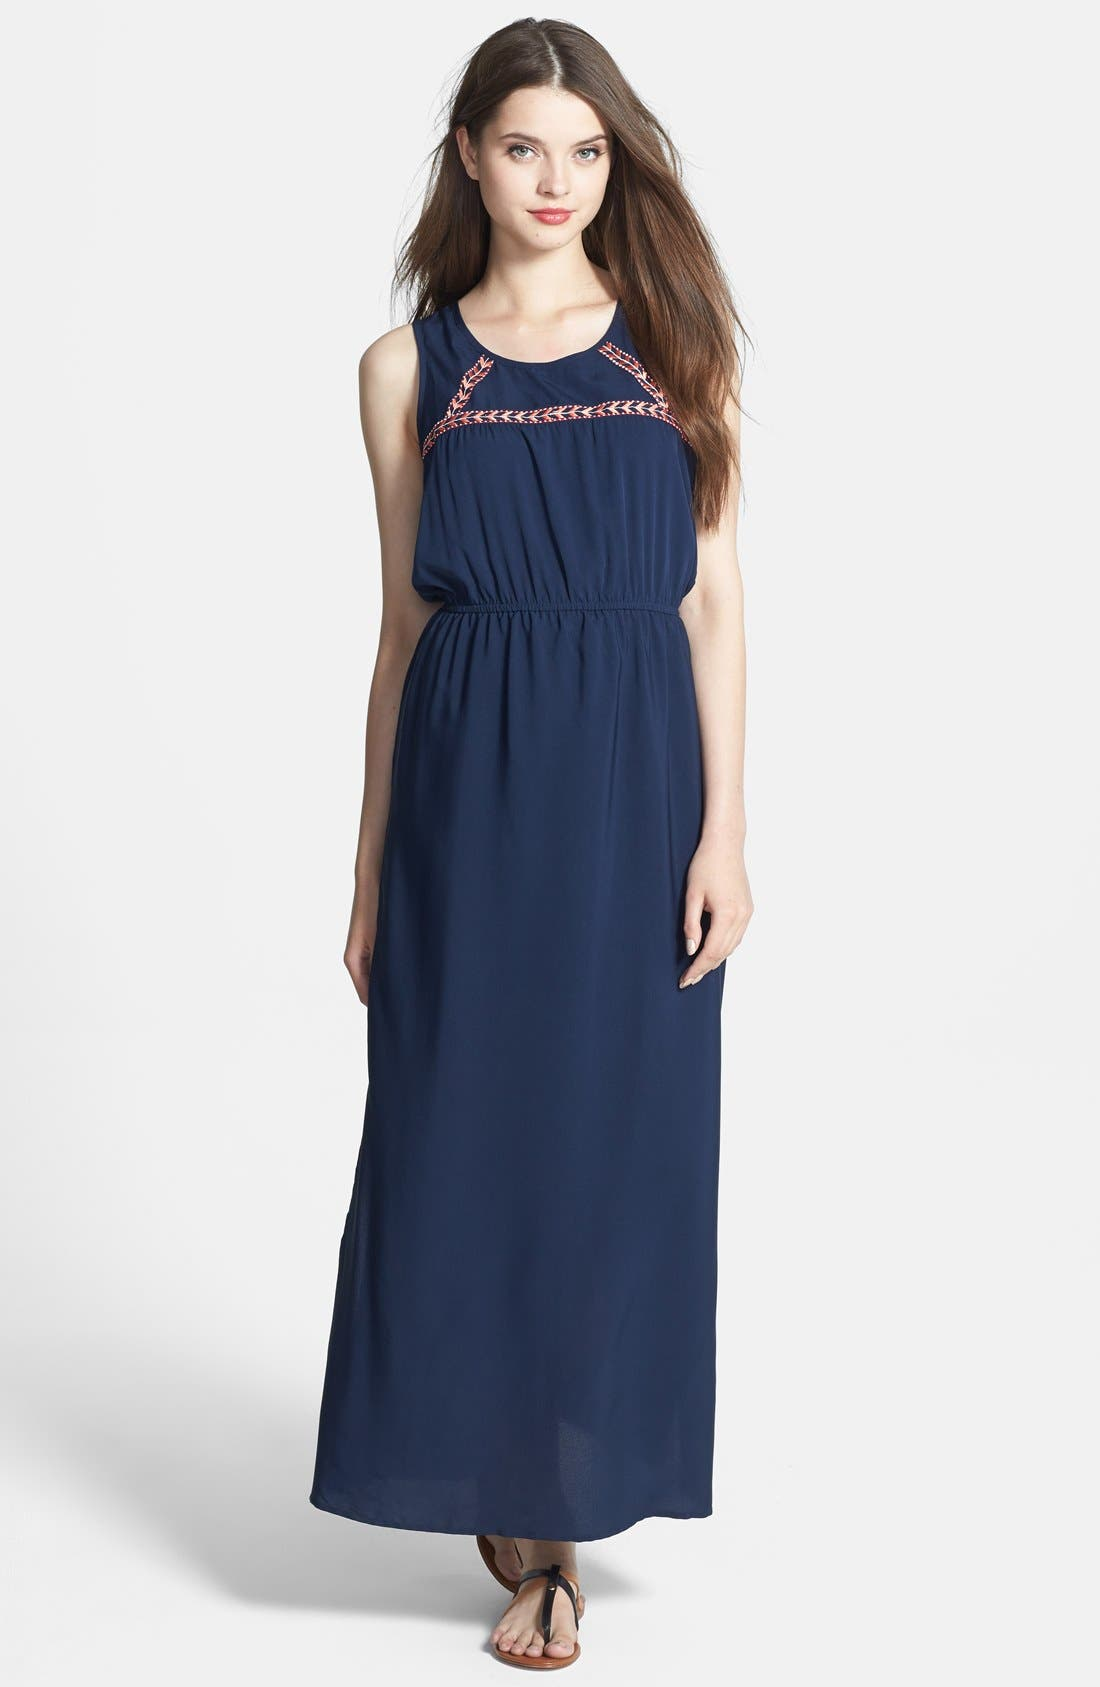 Main Image - Olive & Oak Embroidered Trim Maxi Dress